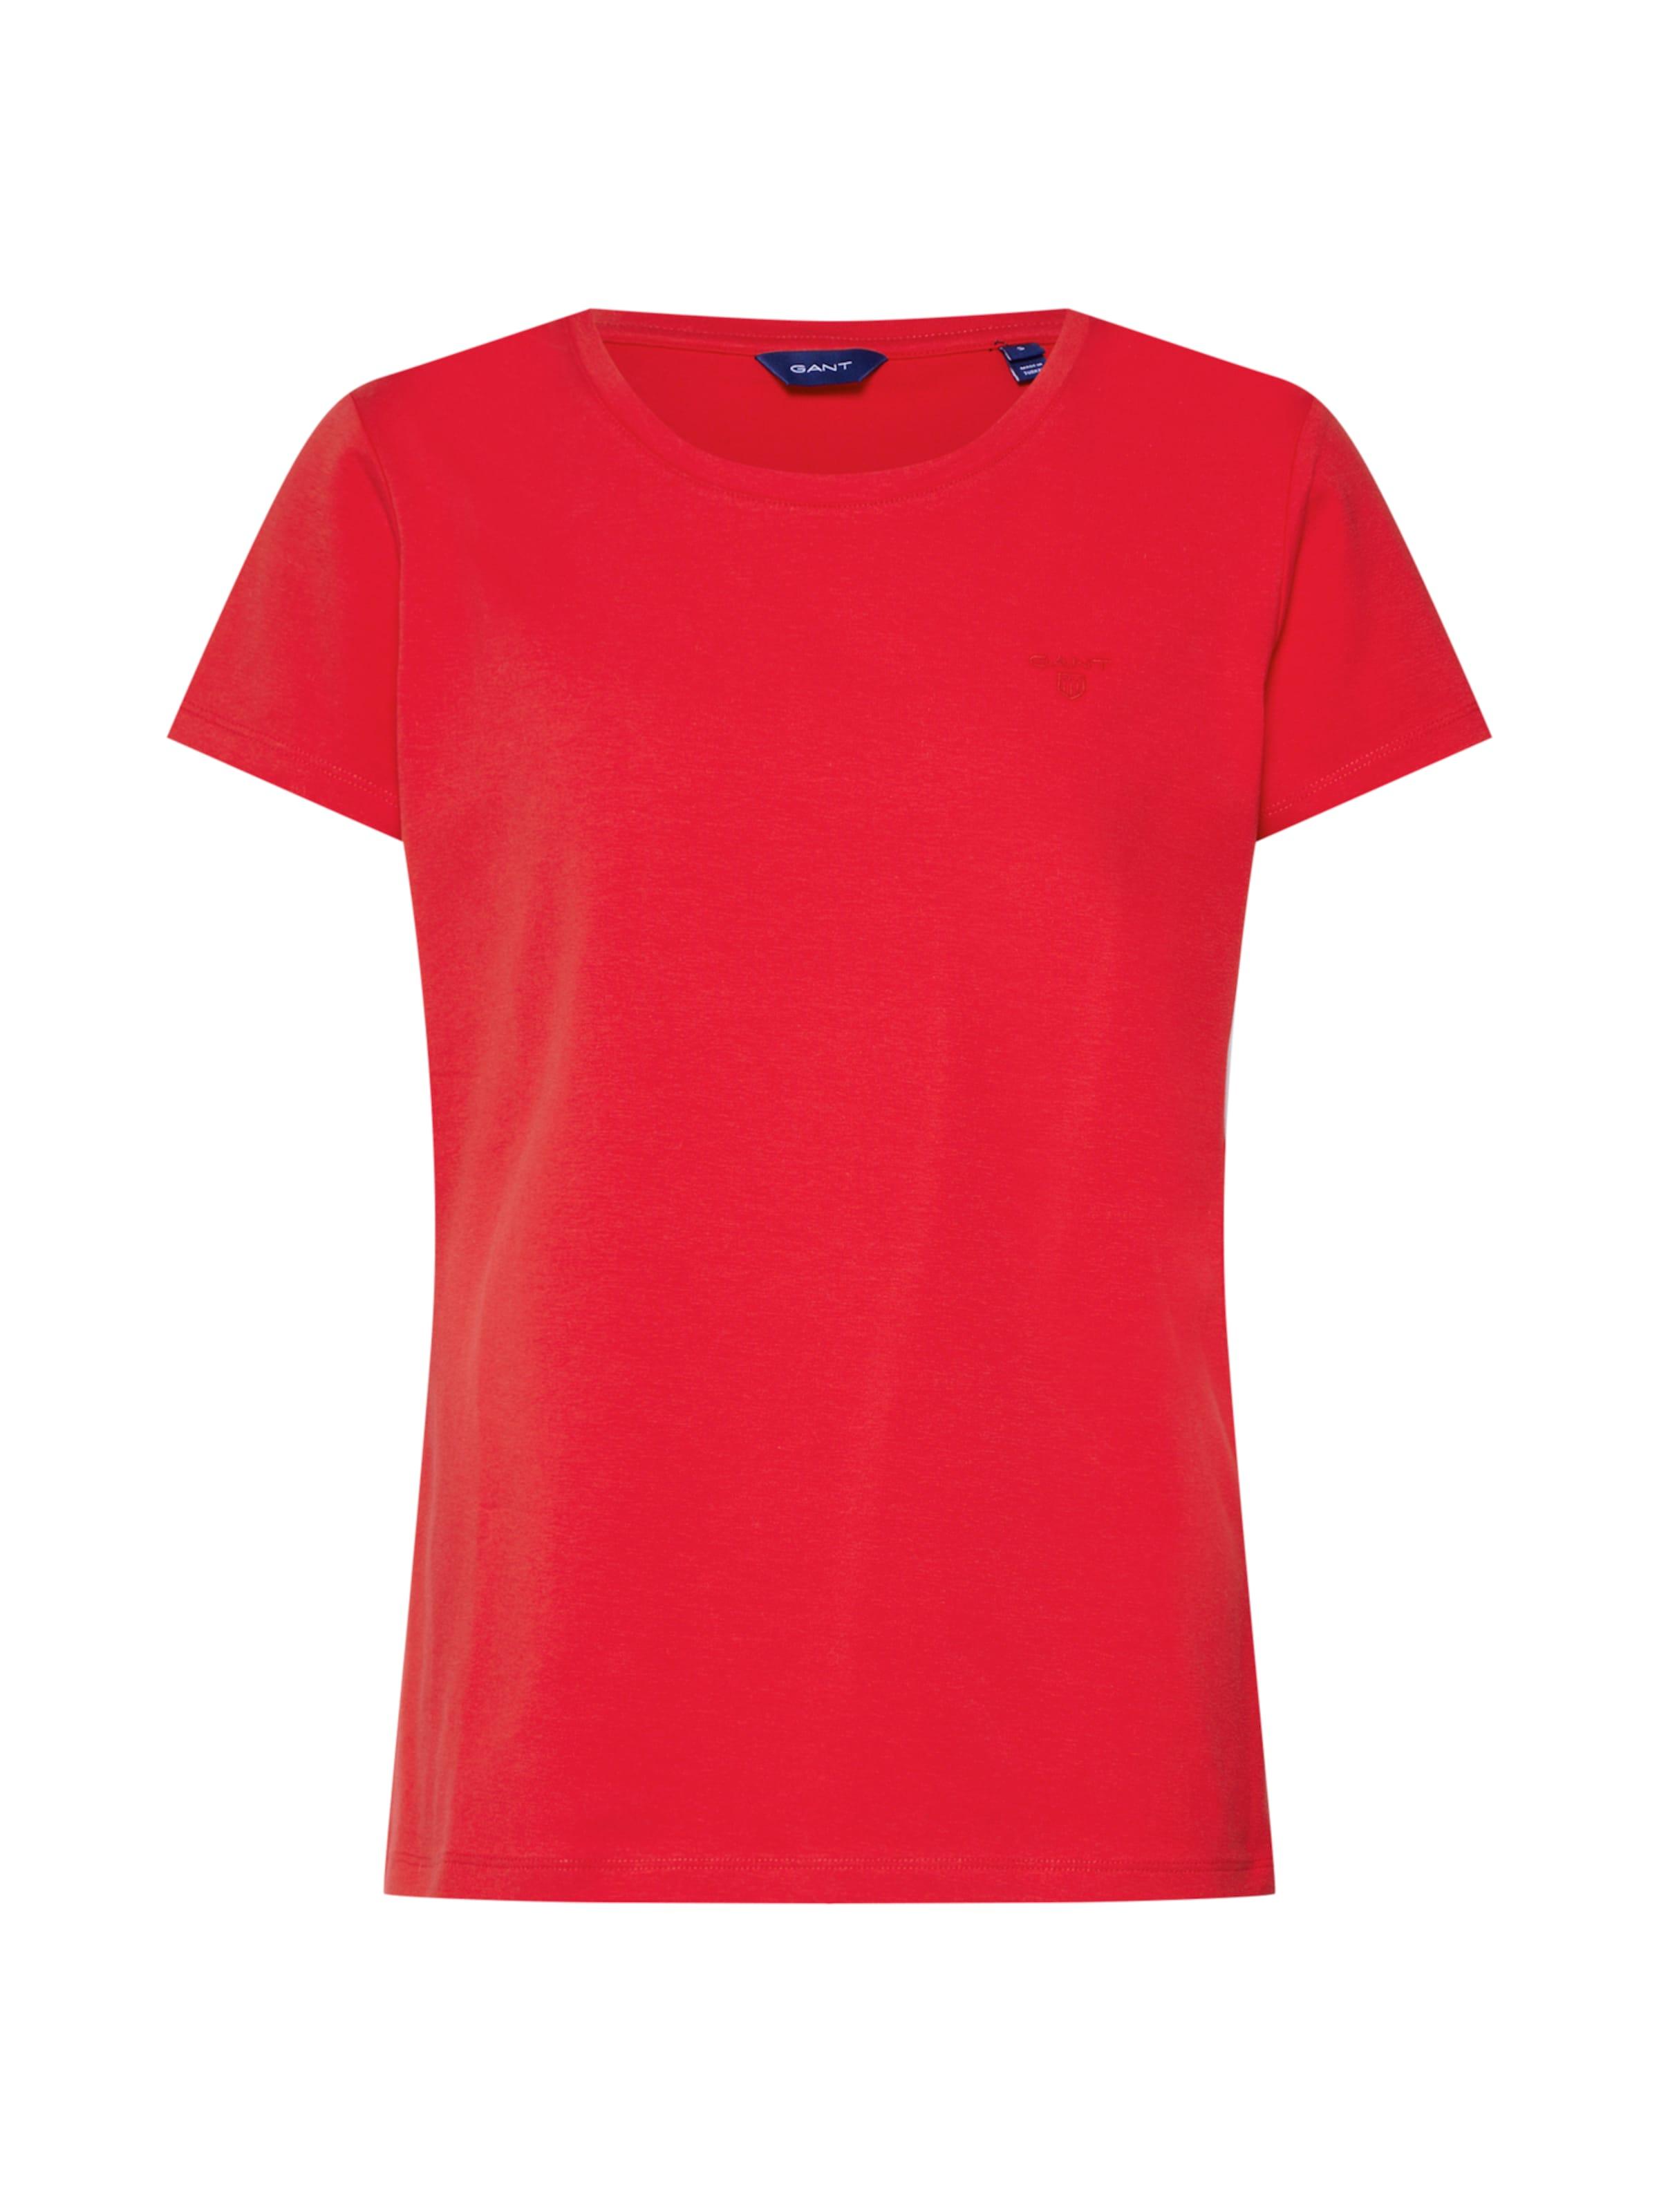 En 'ela' Gant T shirt Rose wOPn08kX